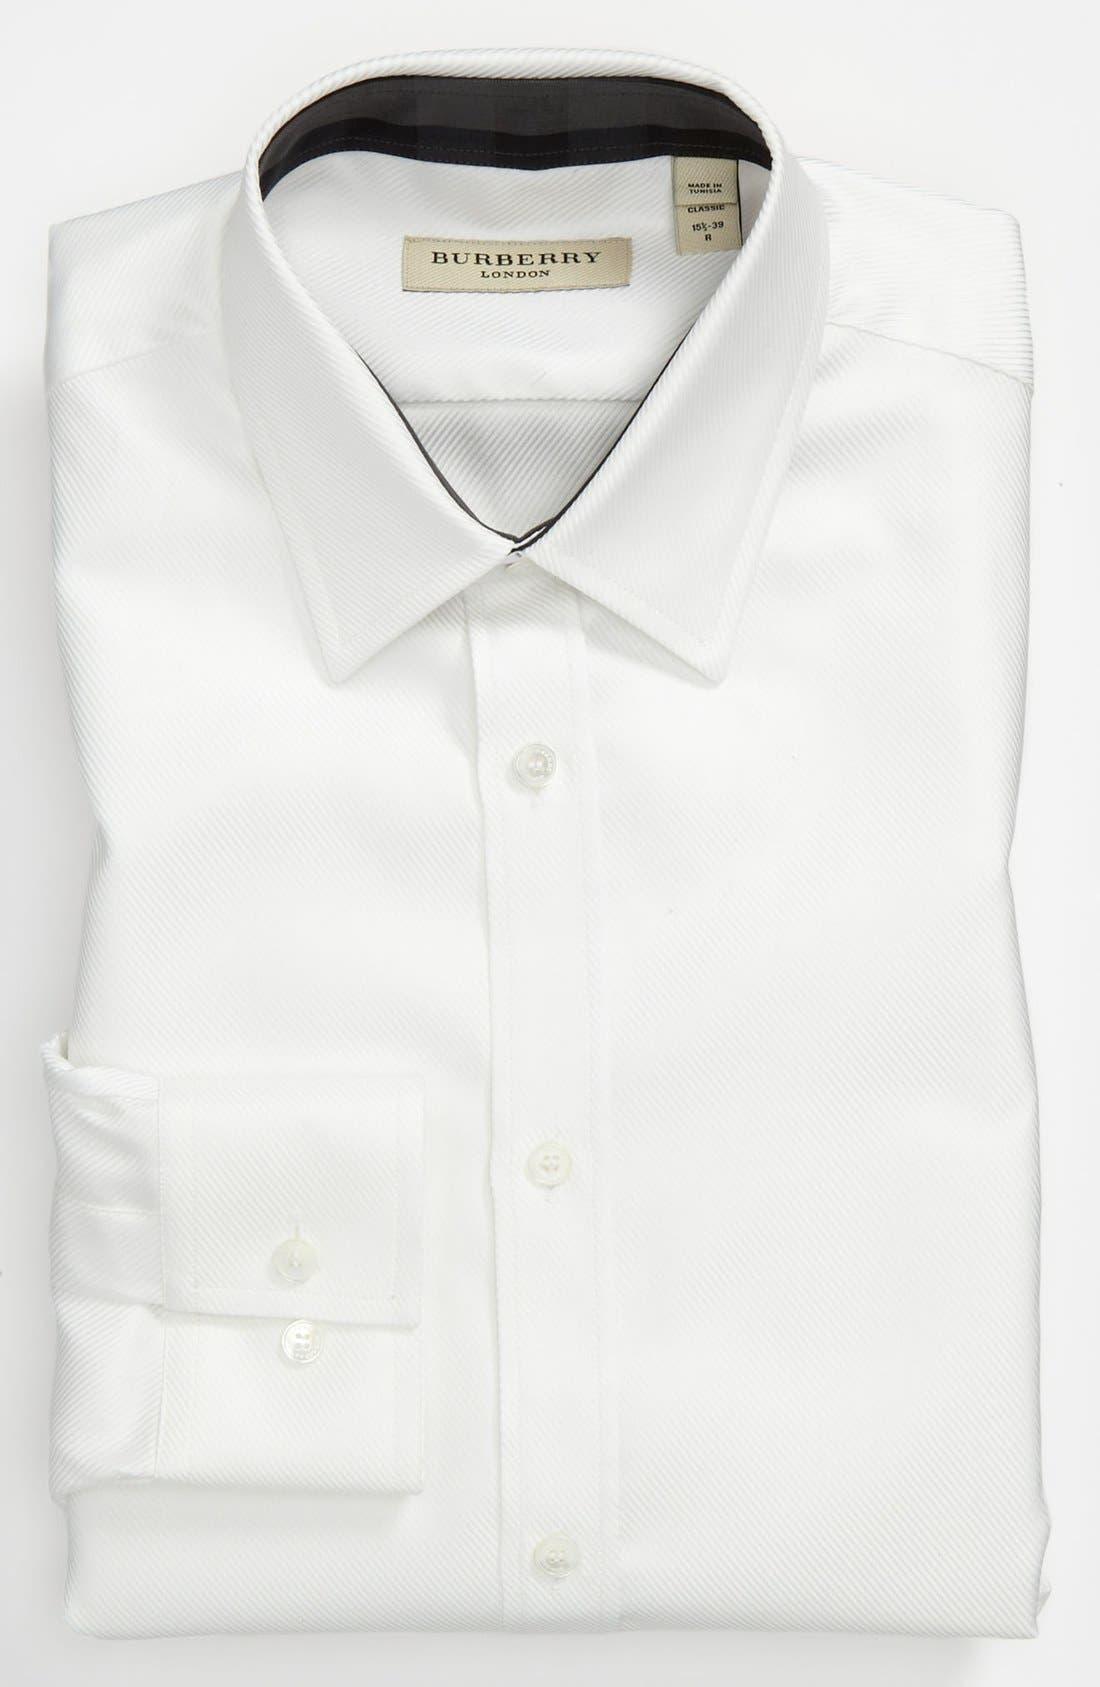 Alternate Image 1 Selected - Burberry London Regular Fit Dress Shirt